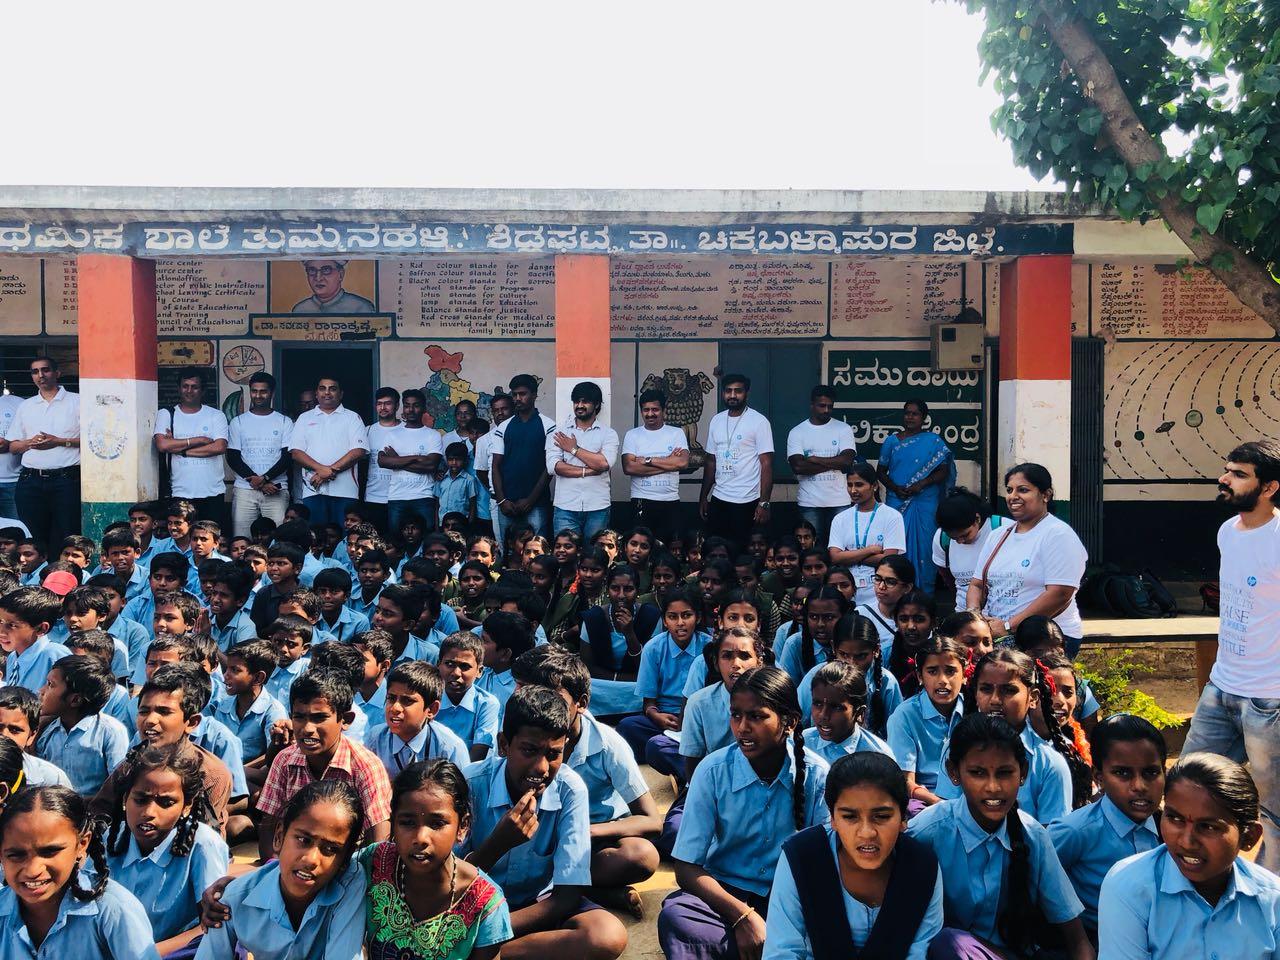 Childrens Day At Govt School